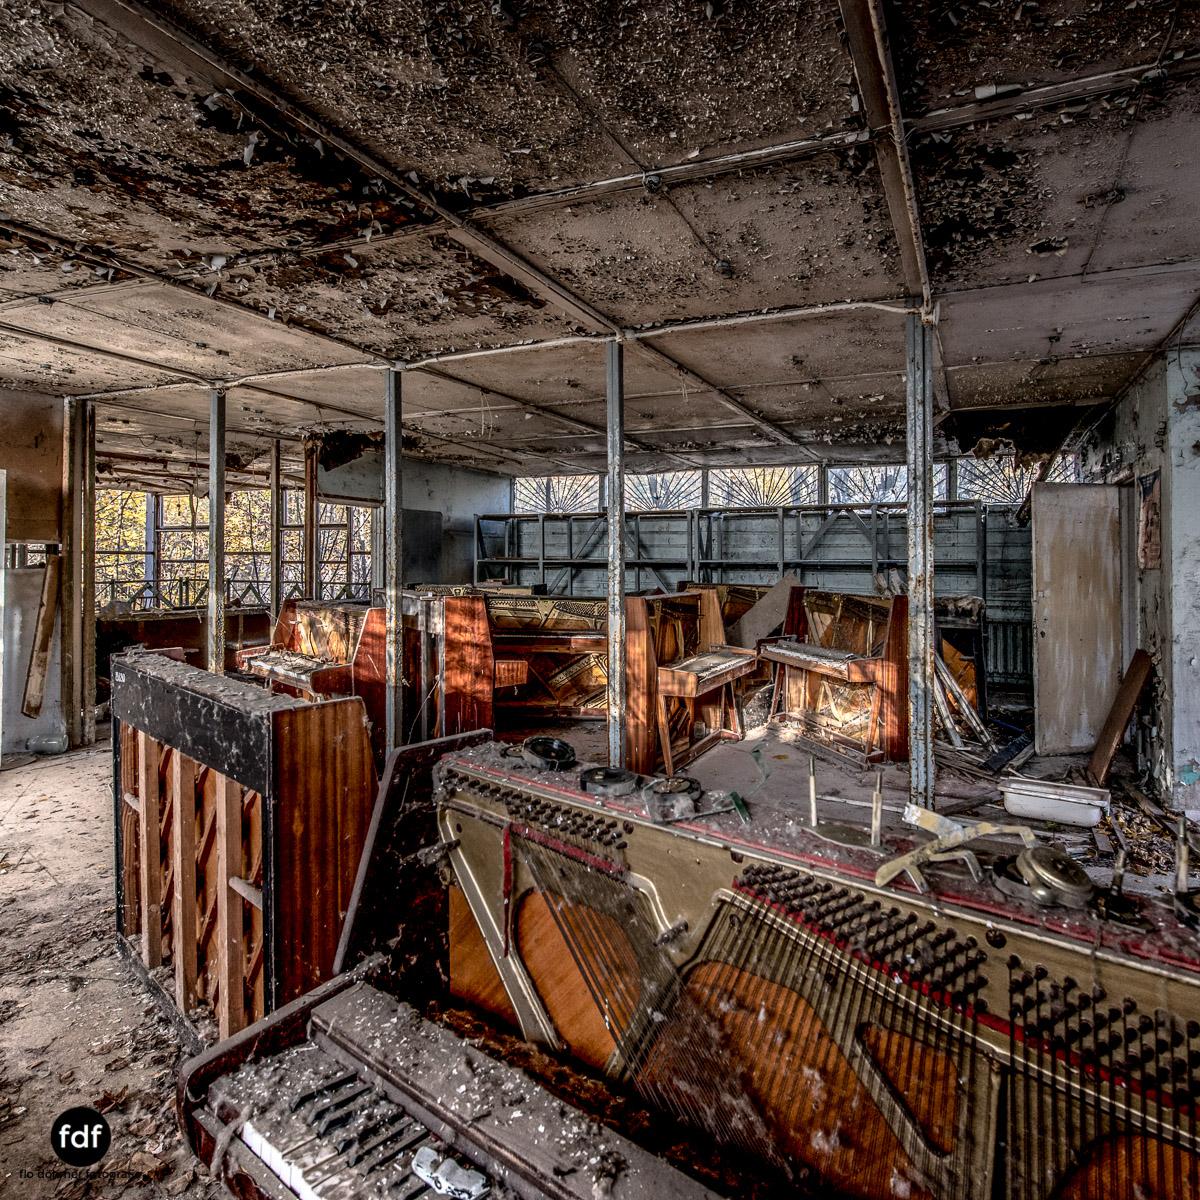 Tschernobyl-Chernobyl-Prypjat-Urbex-Lost-Place-Klavierhaus-Kindergarten-4.jpg